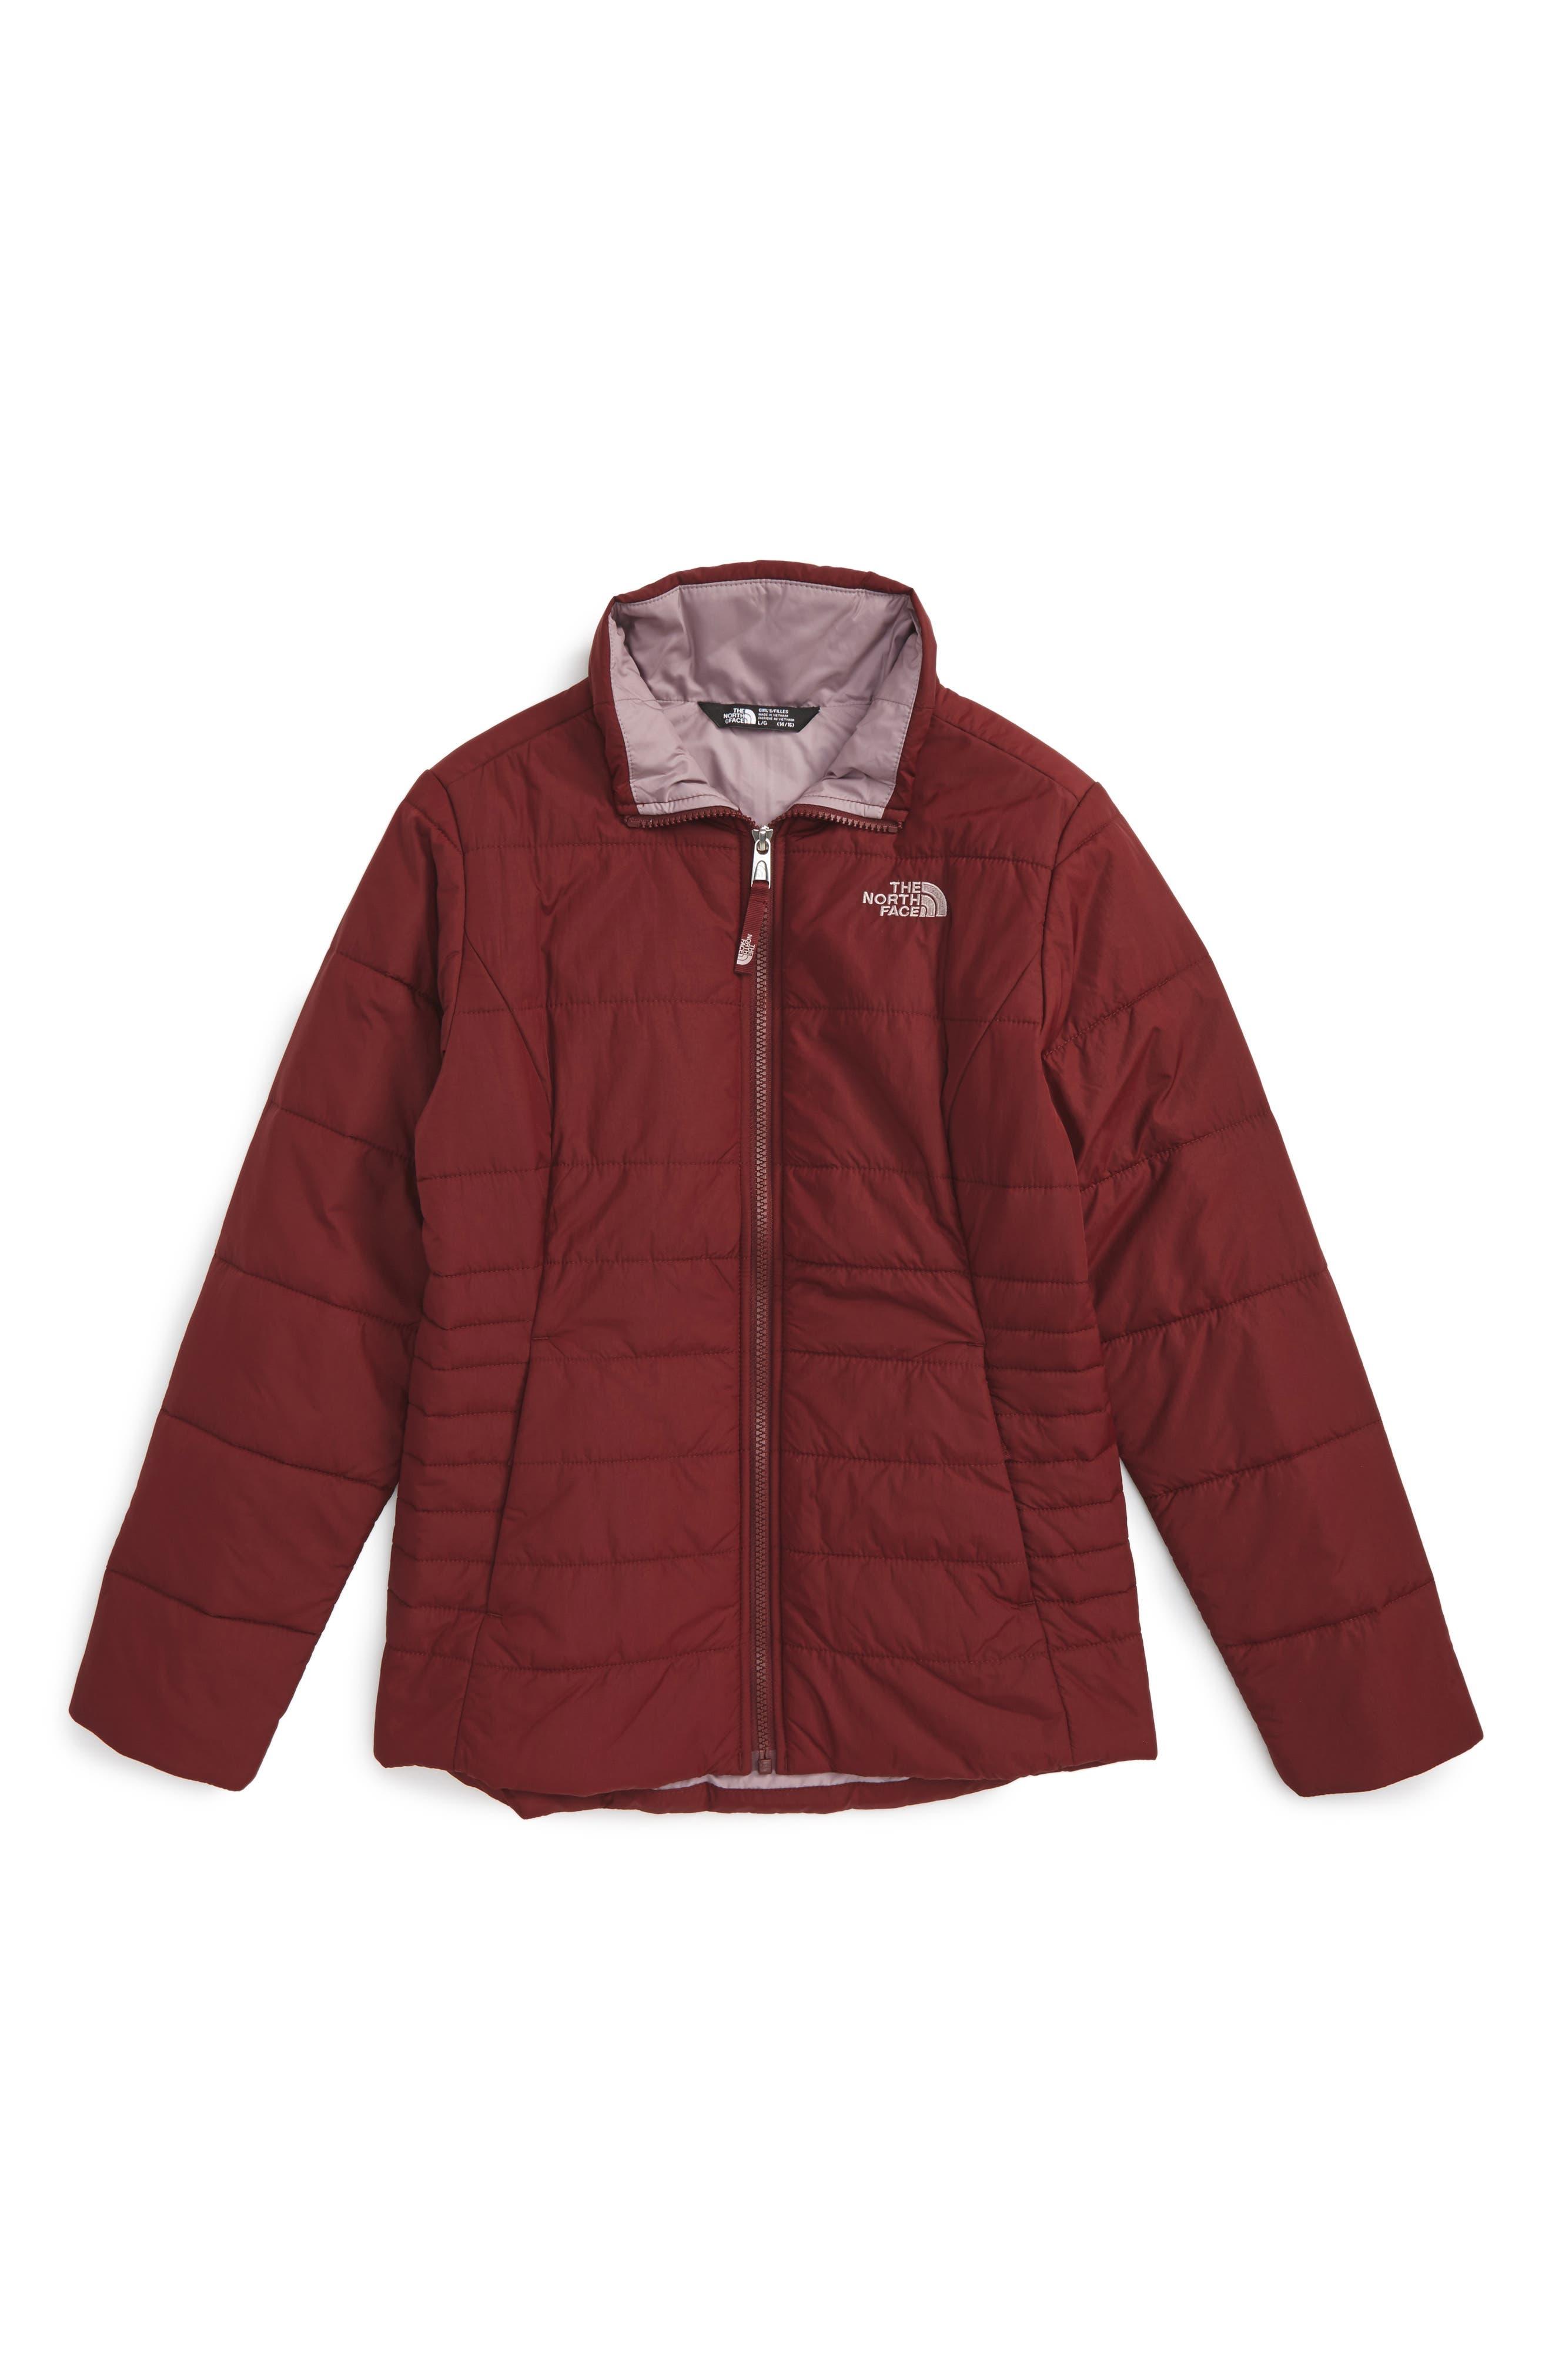 Main Image - The North Face Harway Heatseeker™Water-Resistant Jacket (Little Girls & Big Girls)